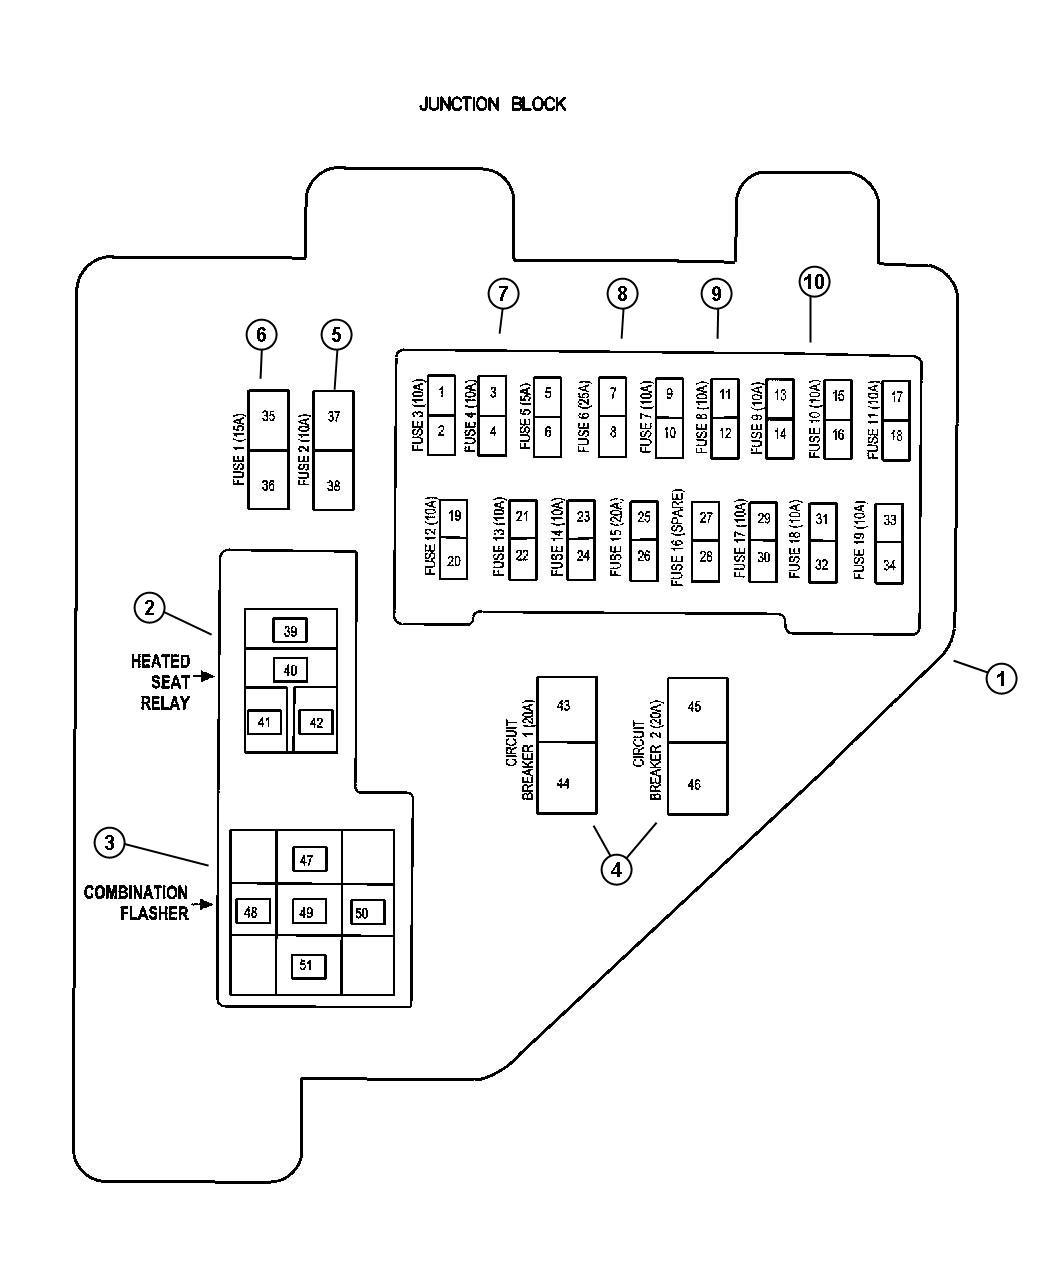 Dodge Ram 1500 Trailer Wiring Diagram - Wiring Diagram